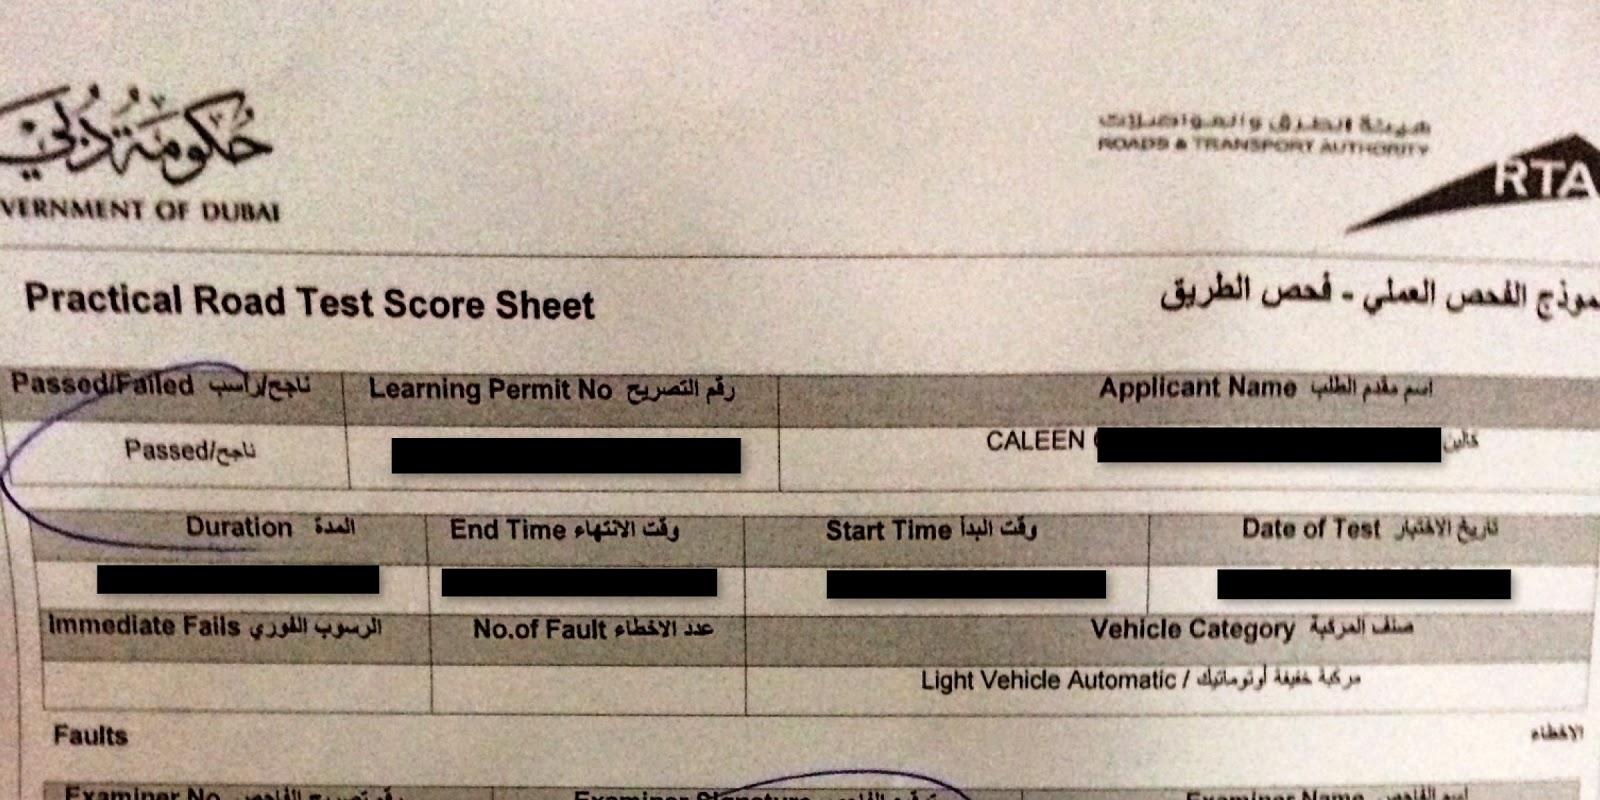 Driver Knowledge Test - Free Online Practice Quizzes